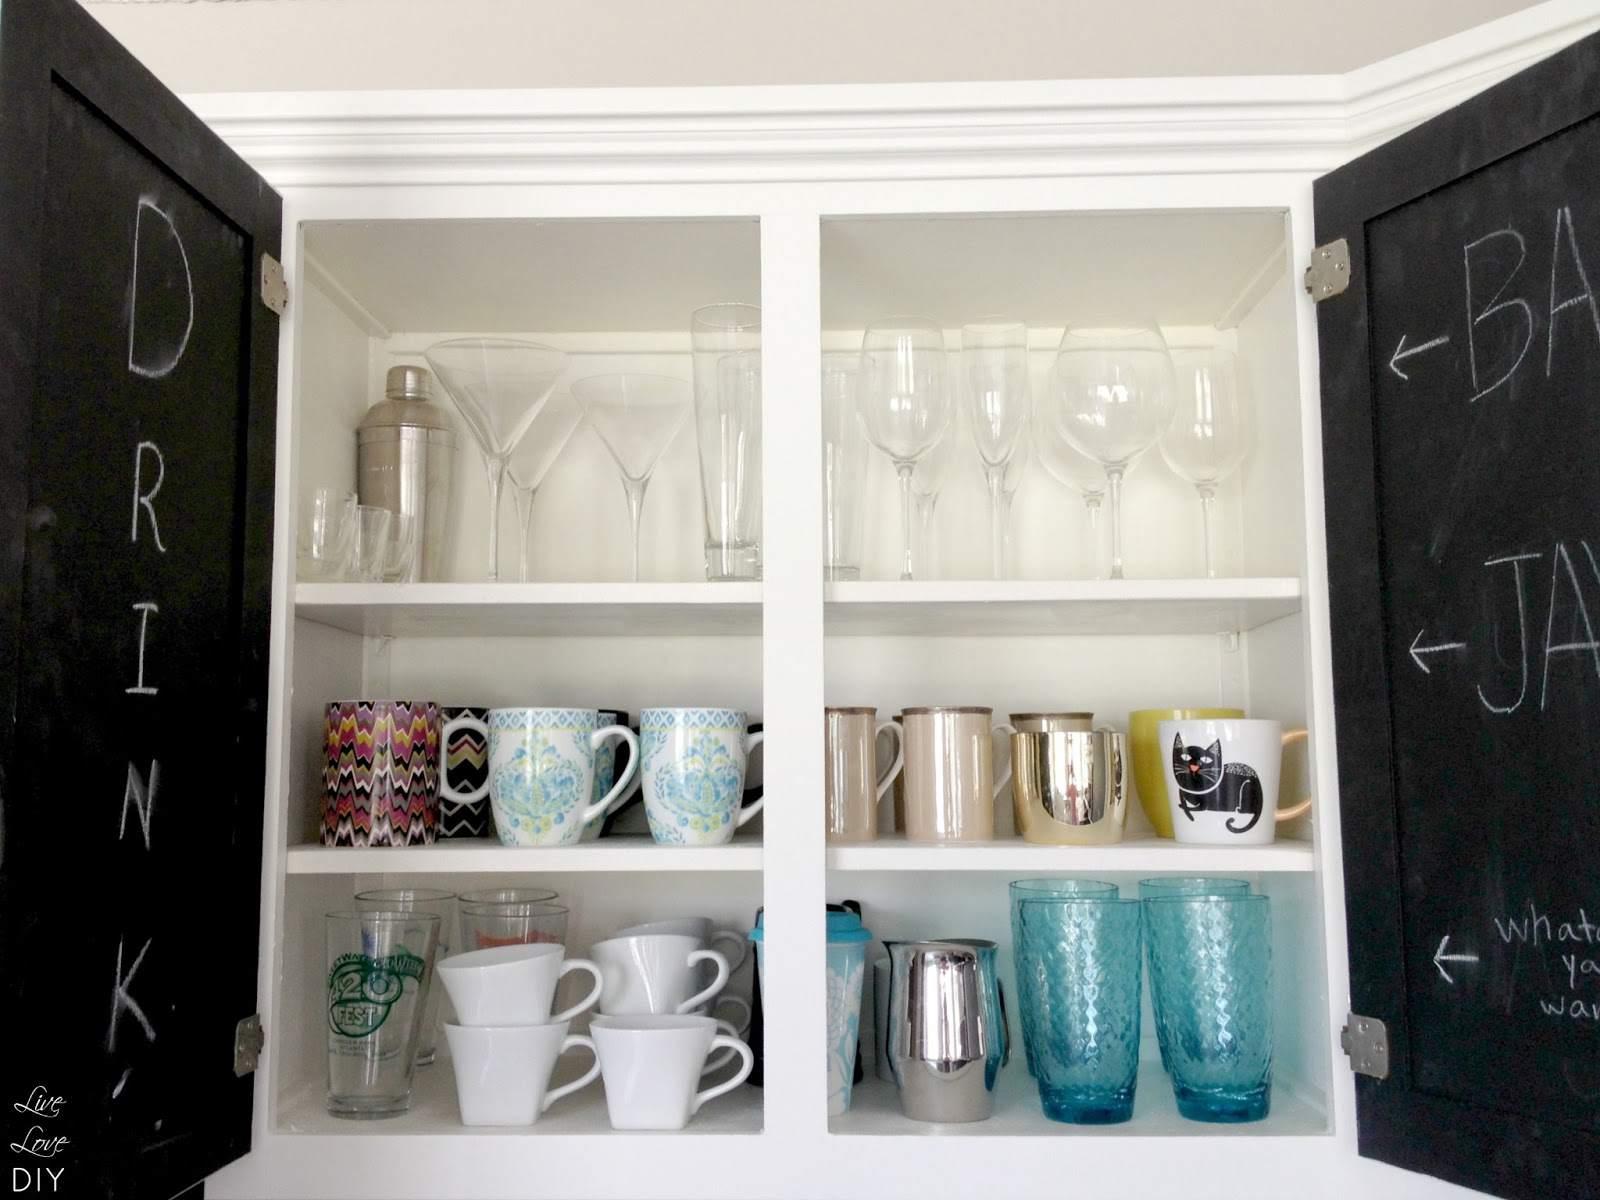 Armarios de cocina pintados de blanco con interiores de pizarra